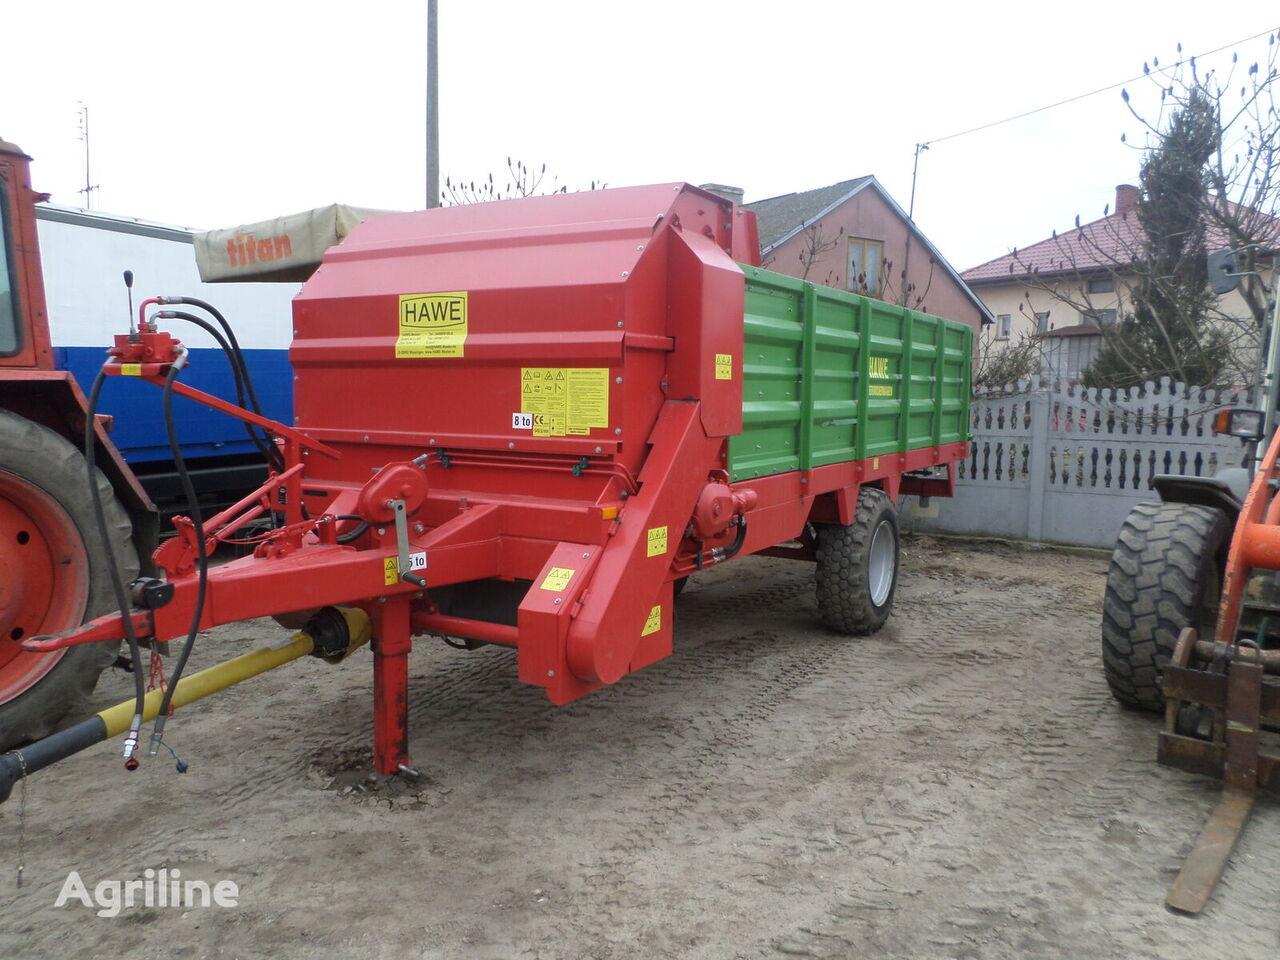 HAWE FDSTA 10 tractor trailer